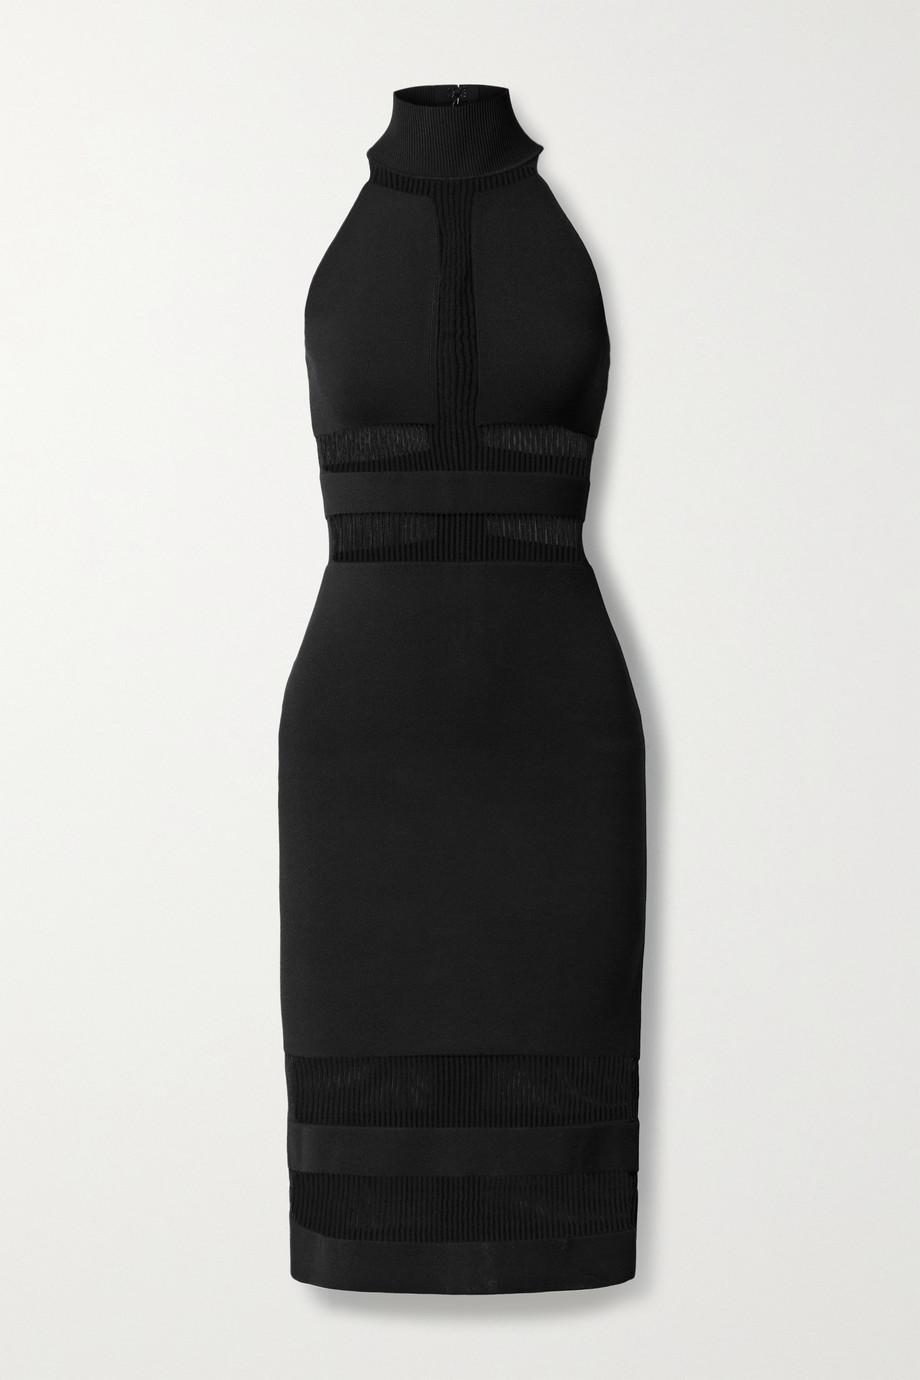 Hervé Léger + NET SUSTAIN + Julia Restoin Roitfeld recycled stretch-jersey and ribbed-knit dress